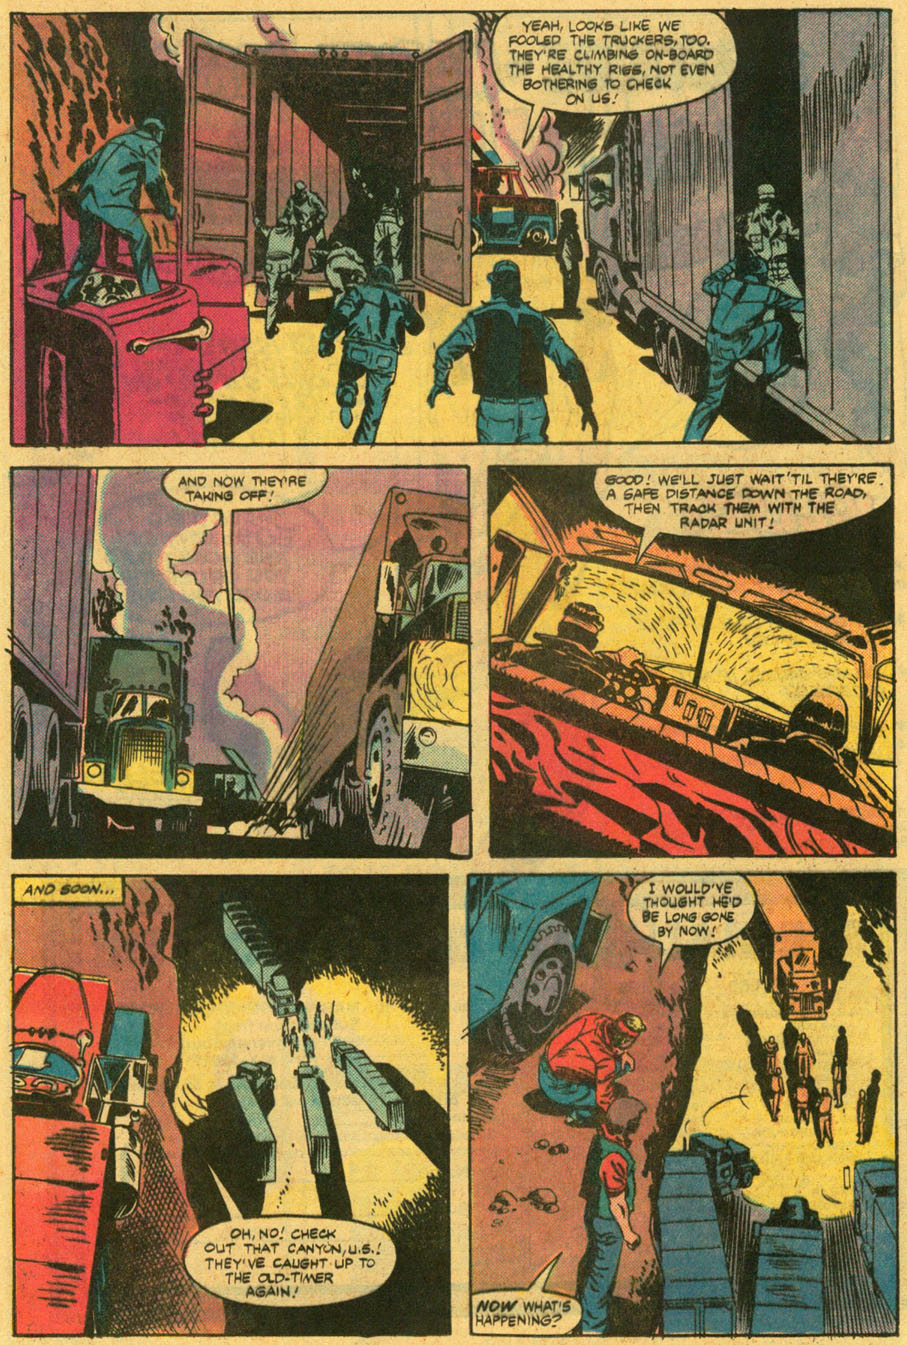 Read online U.S. 1 comic -  Issue #3 - 17